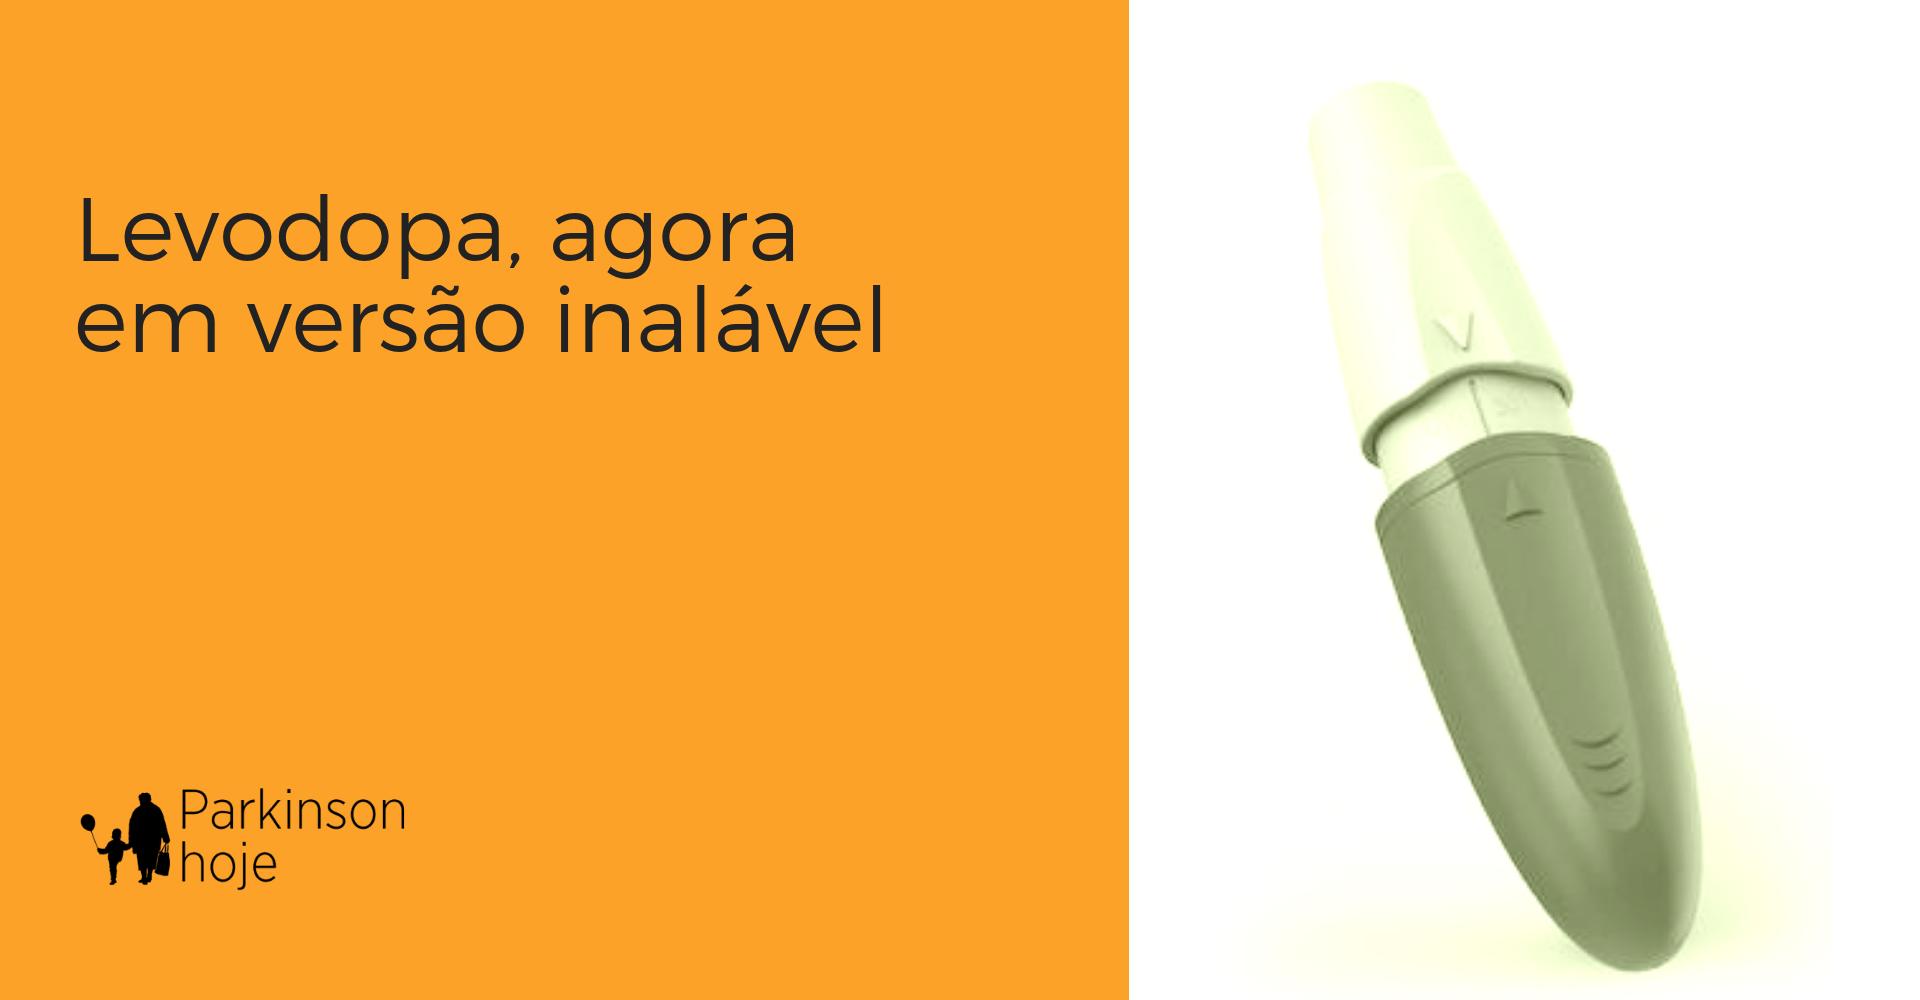 inbrija, versão inalável de levodopa